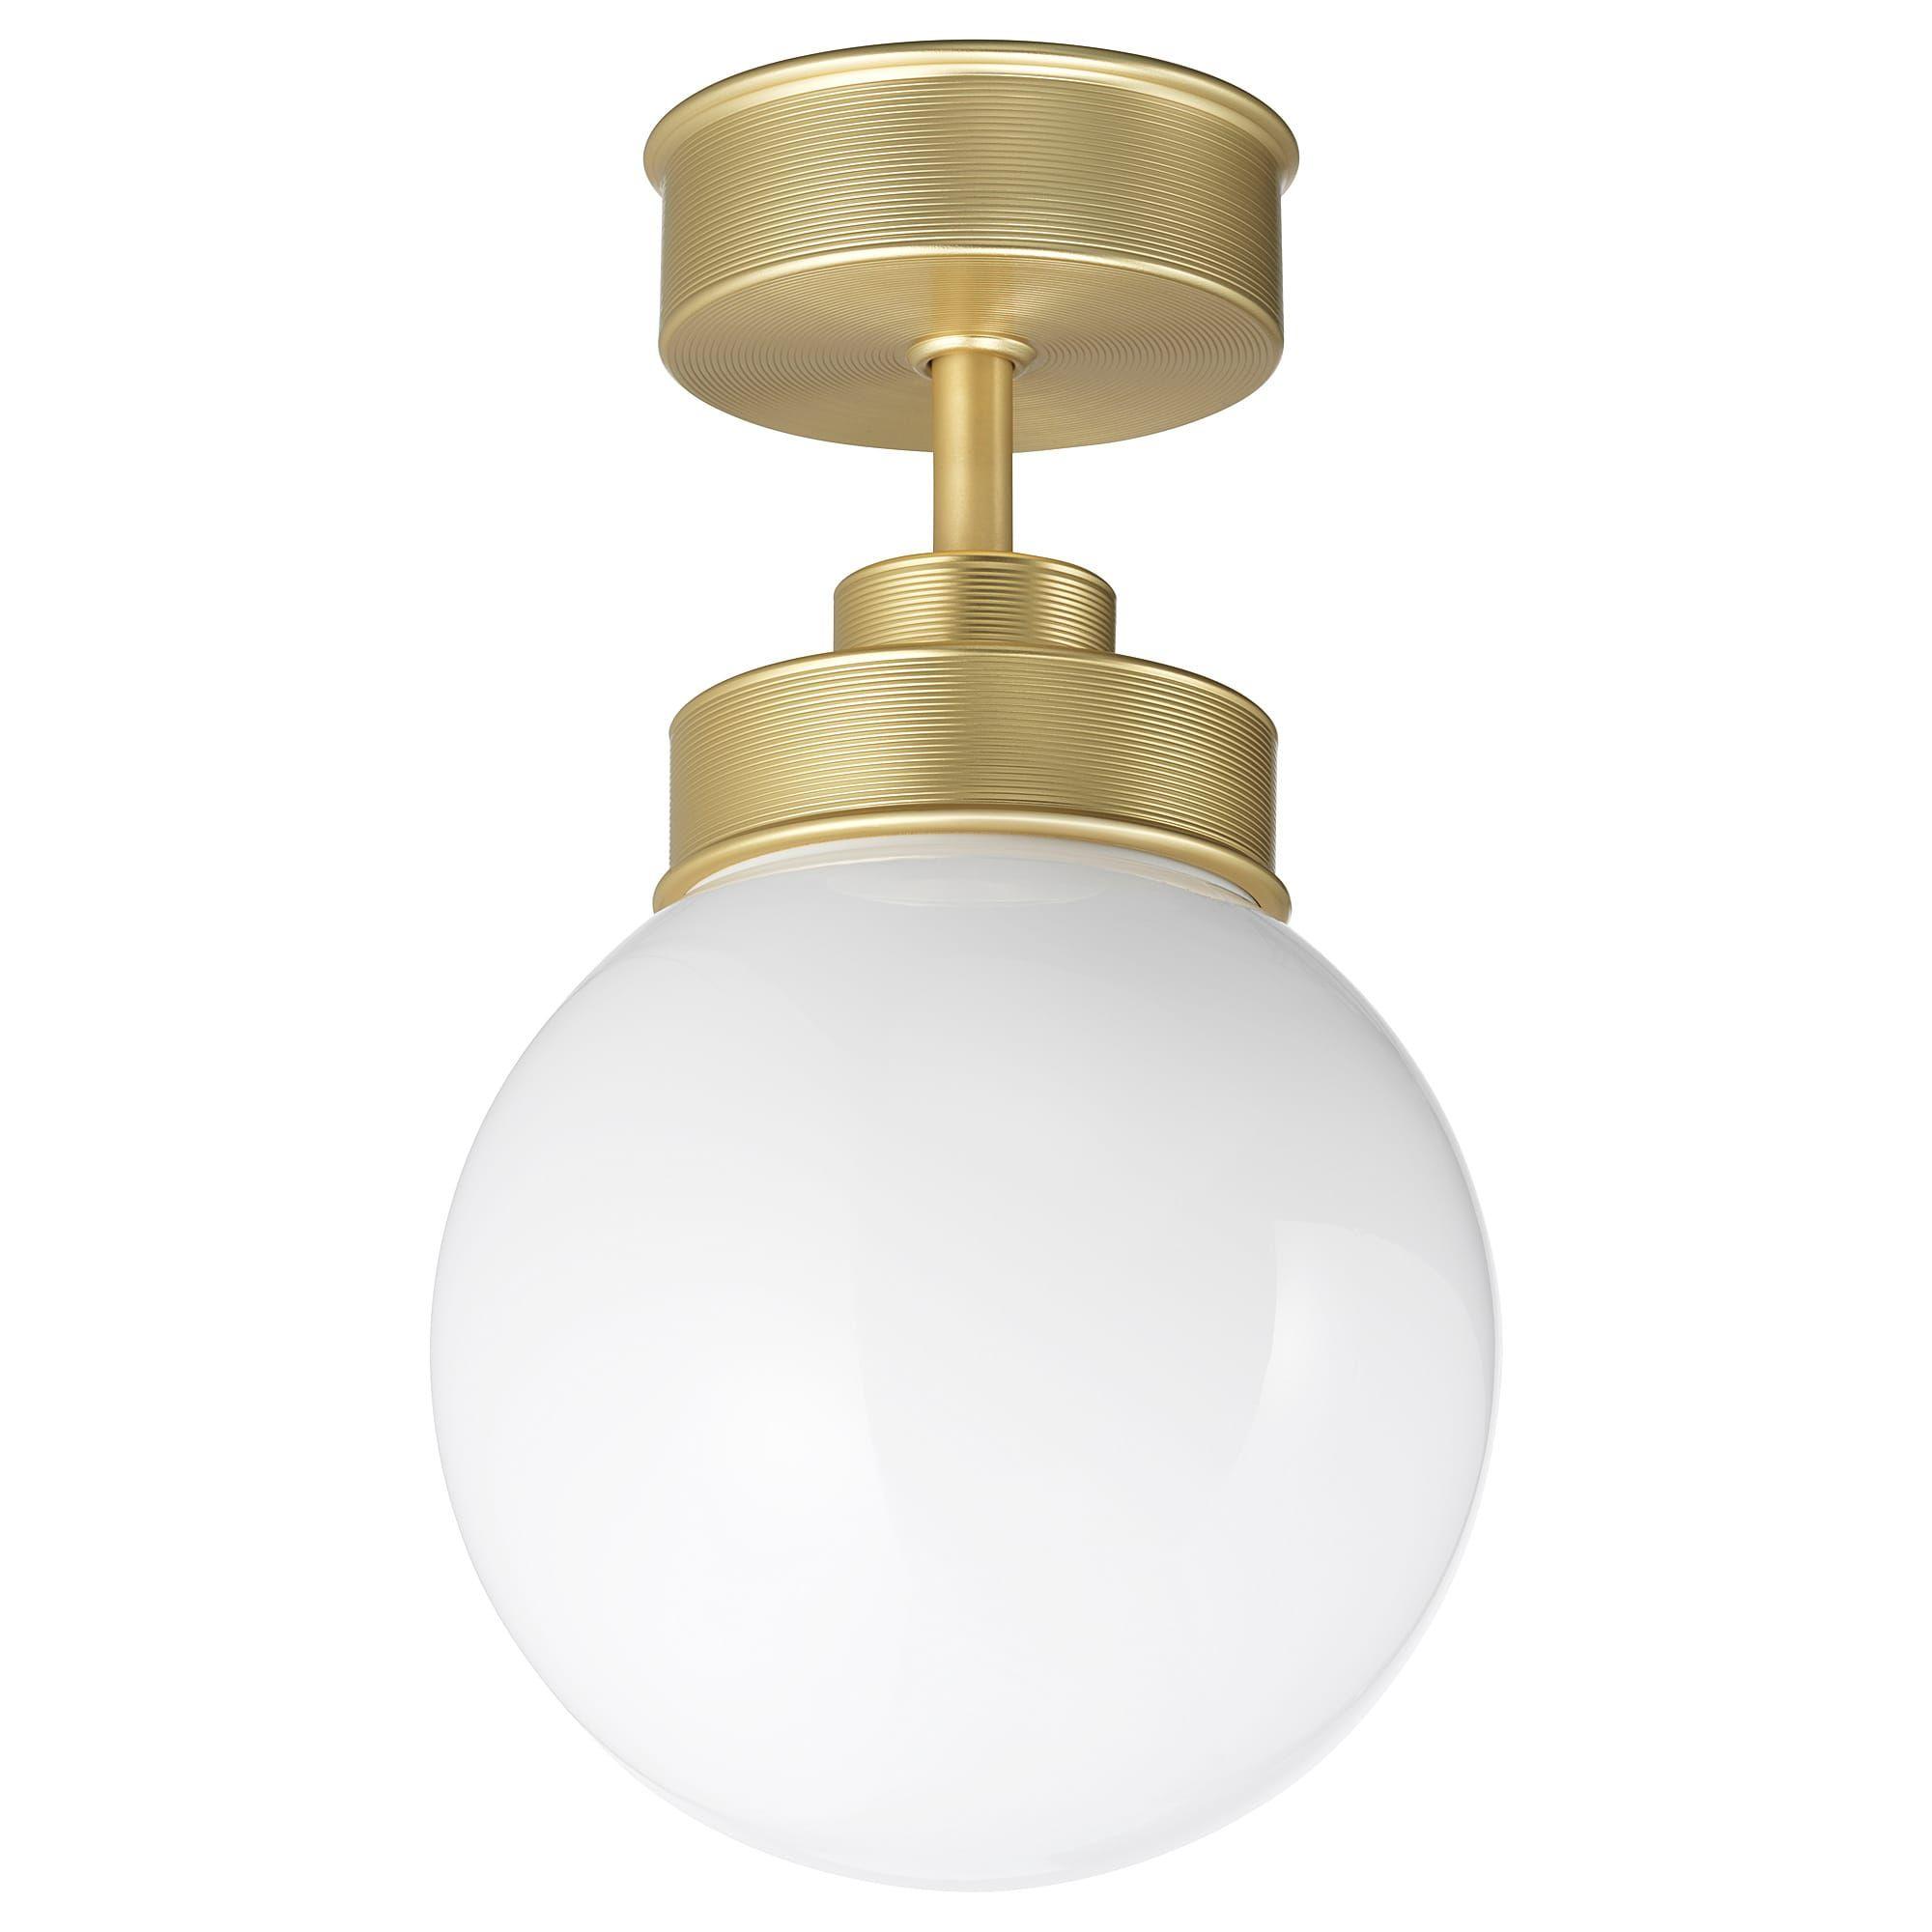 Frihult Brass Colour Ceiling Lamp Ikea In 2020 Deckenlampe Hangeleuchte Messingfarben